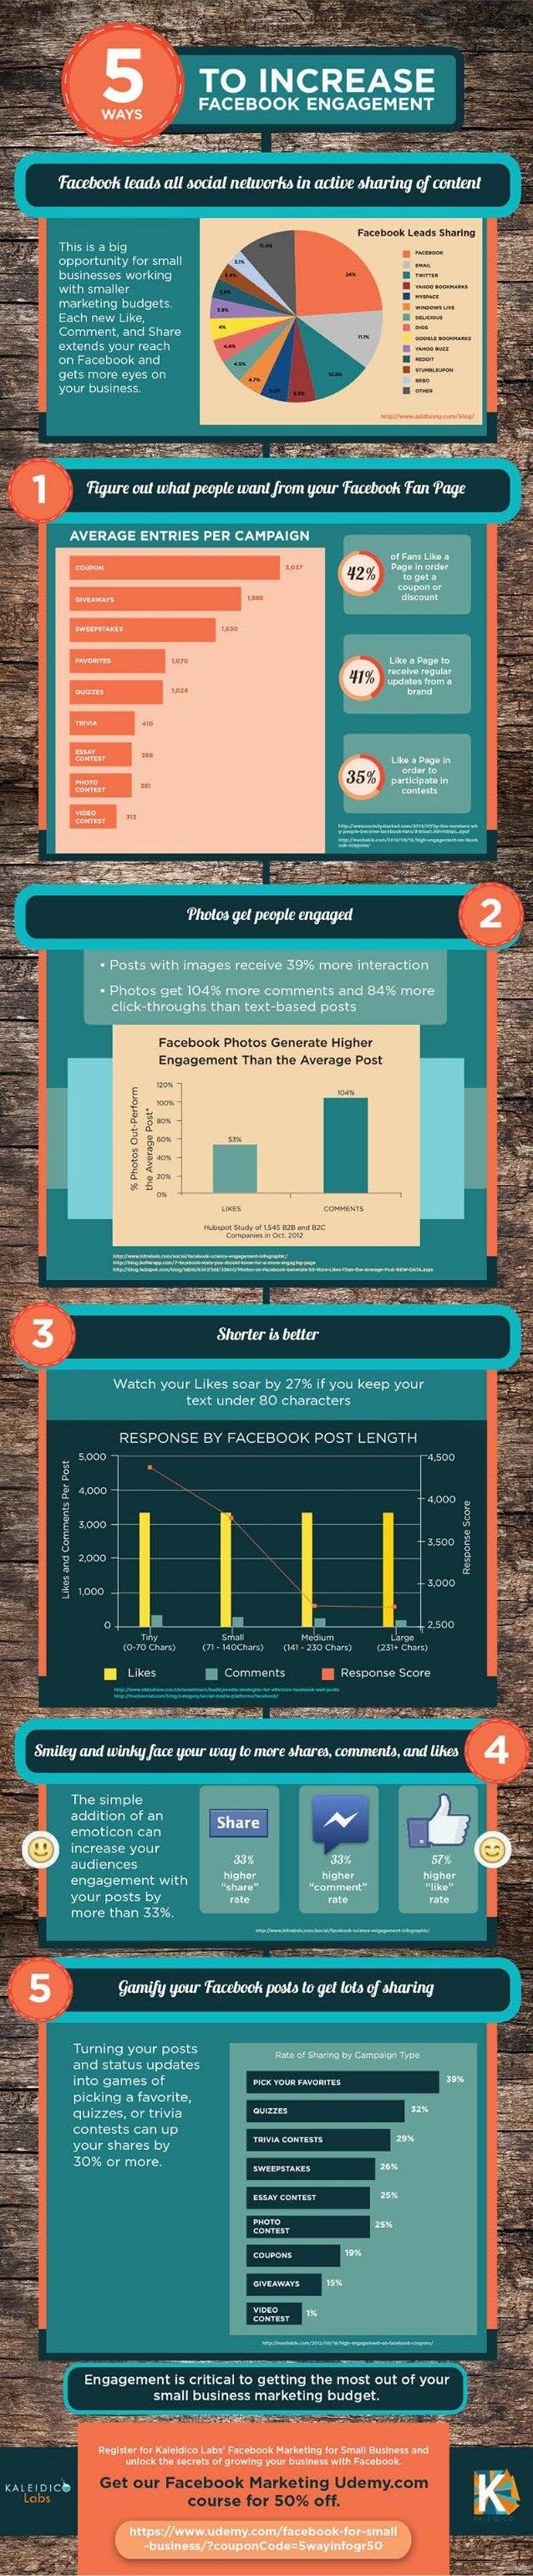 5 Ways To Increase Facebook Engagement